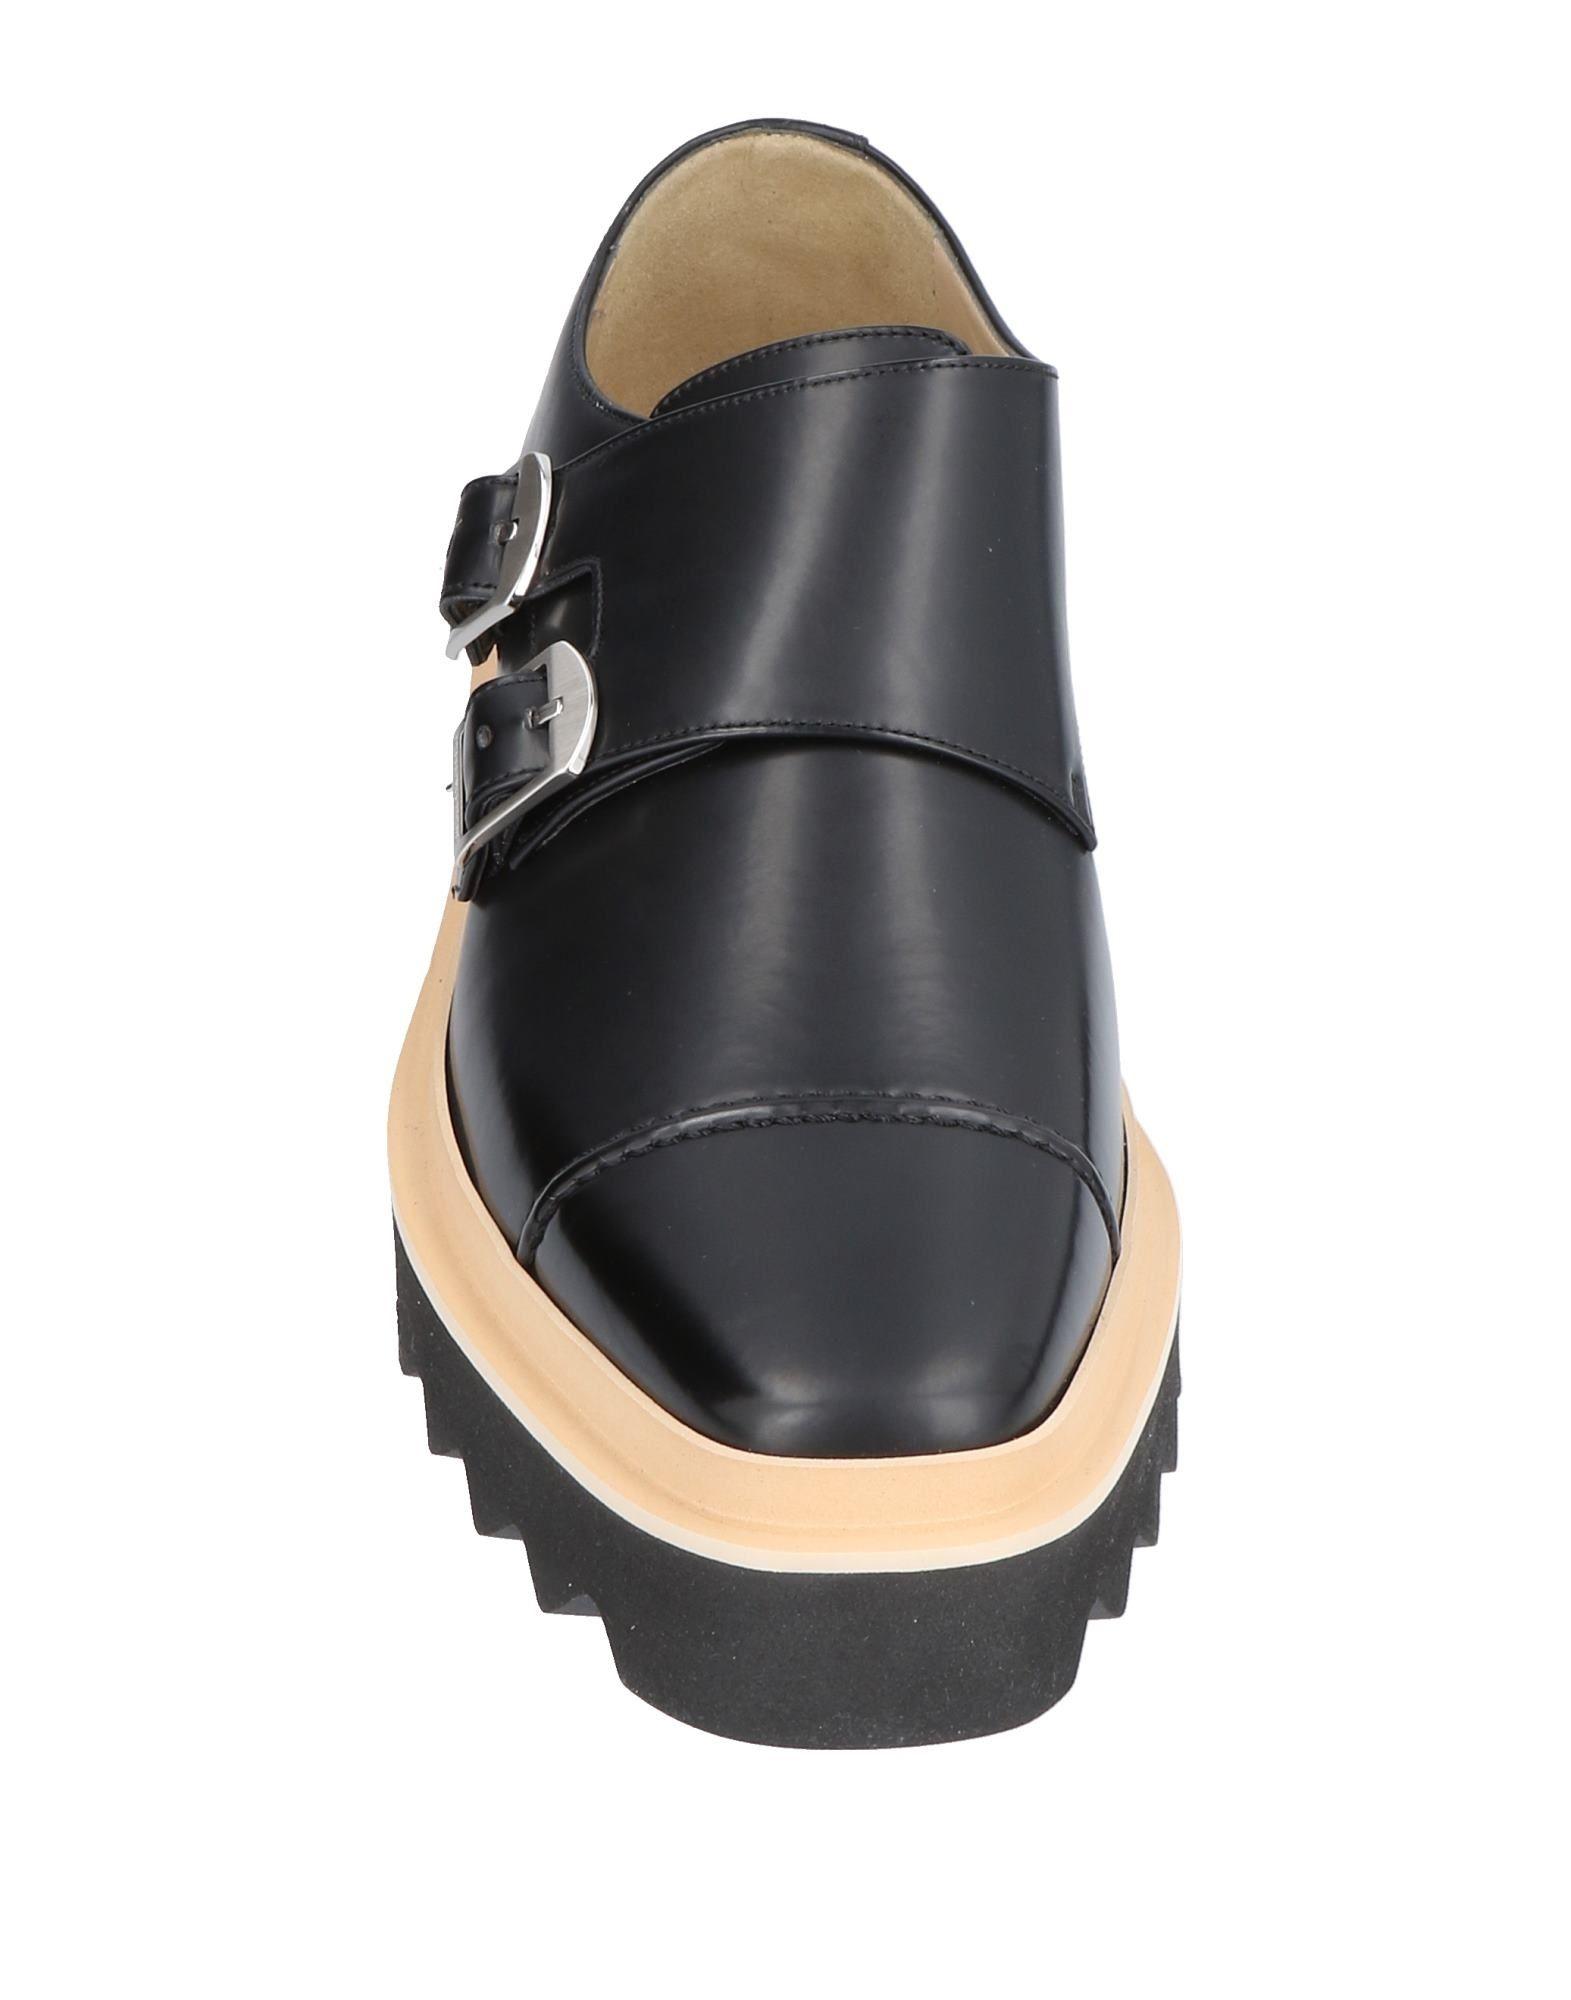 Stella Mccartney Mokassins Herren  11484010TT Gute Qualität beliebte Schuhe